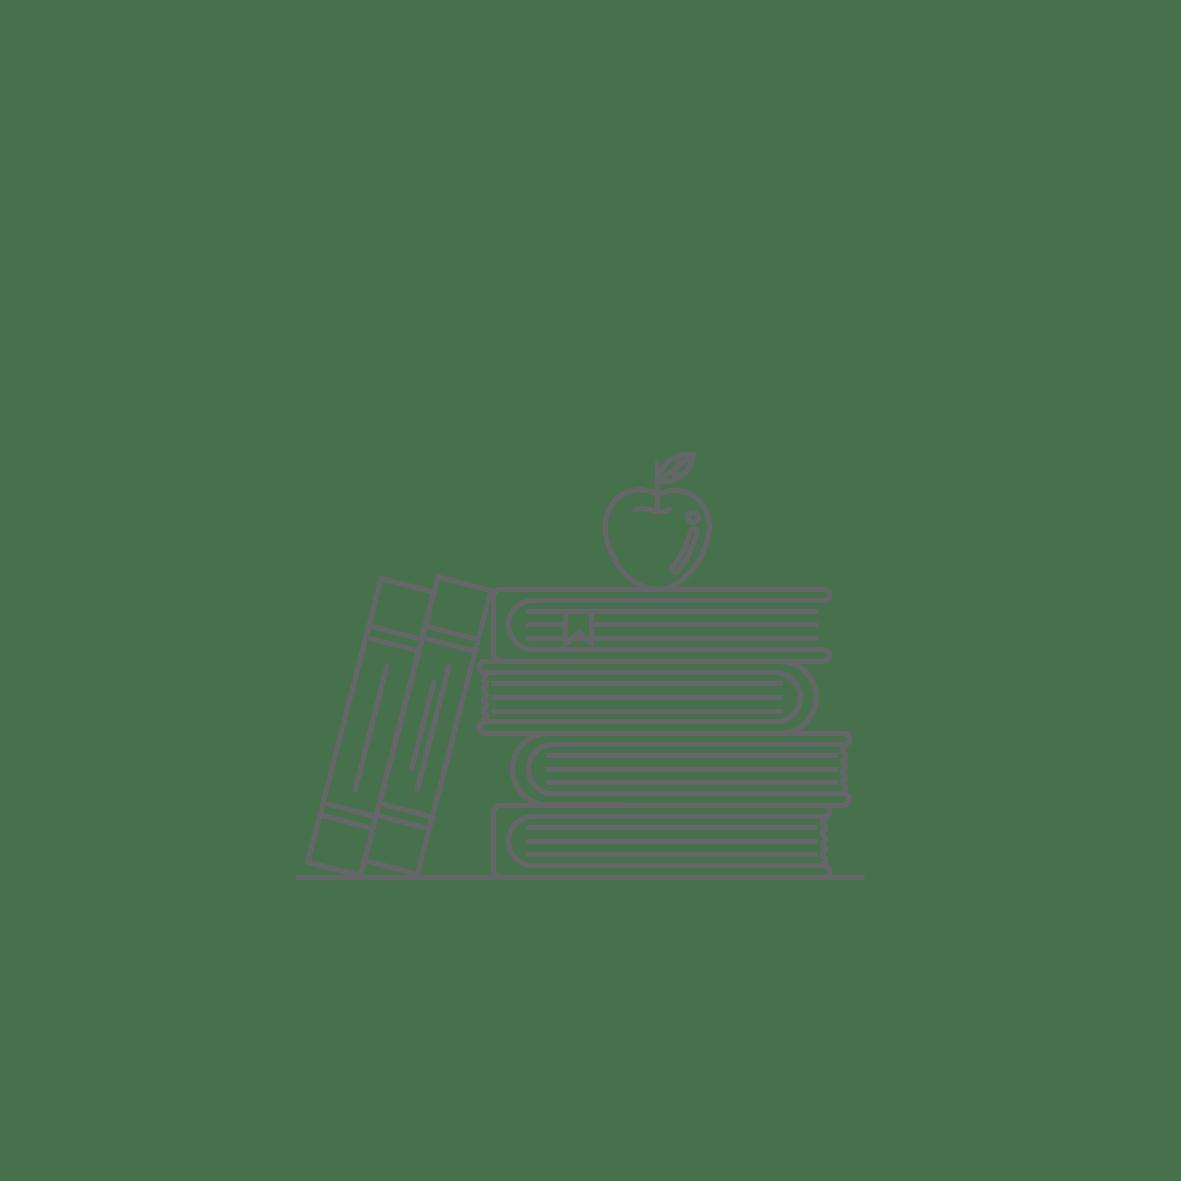 public://media/Zakoni/basic_illustrations_single_files-29.png